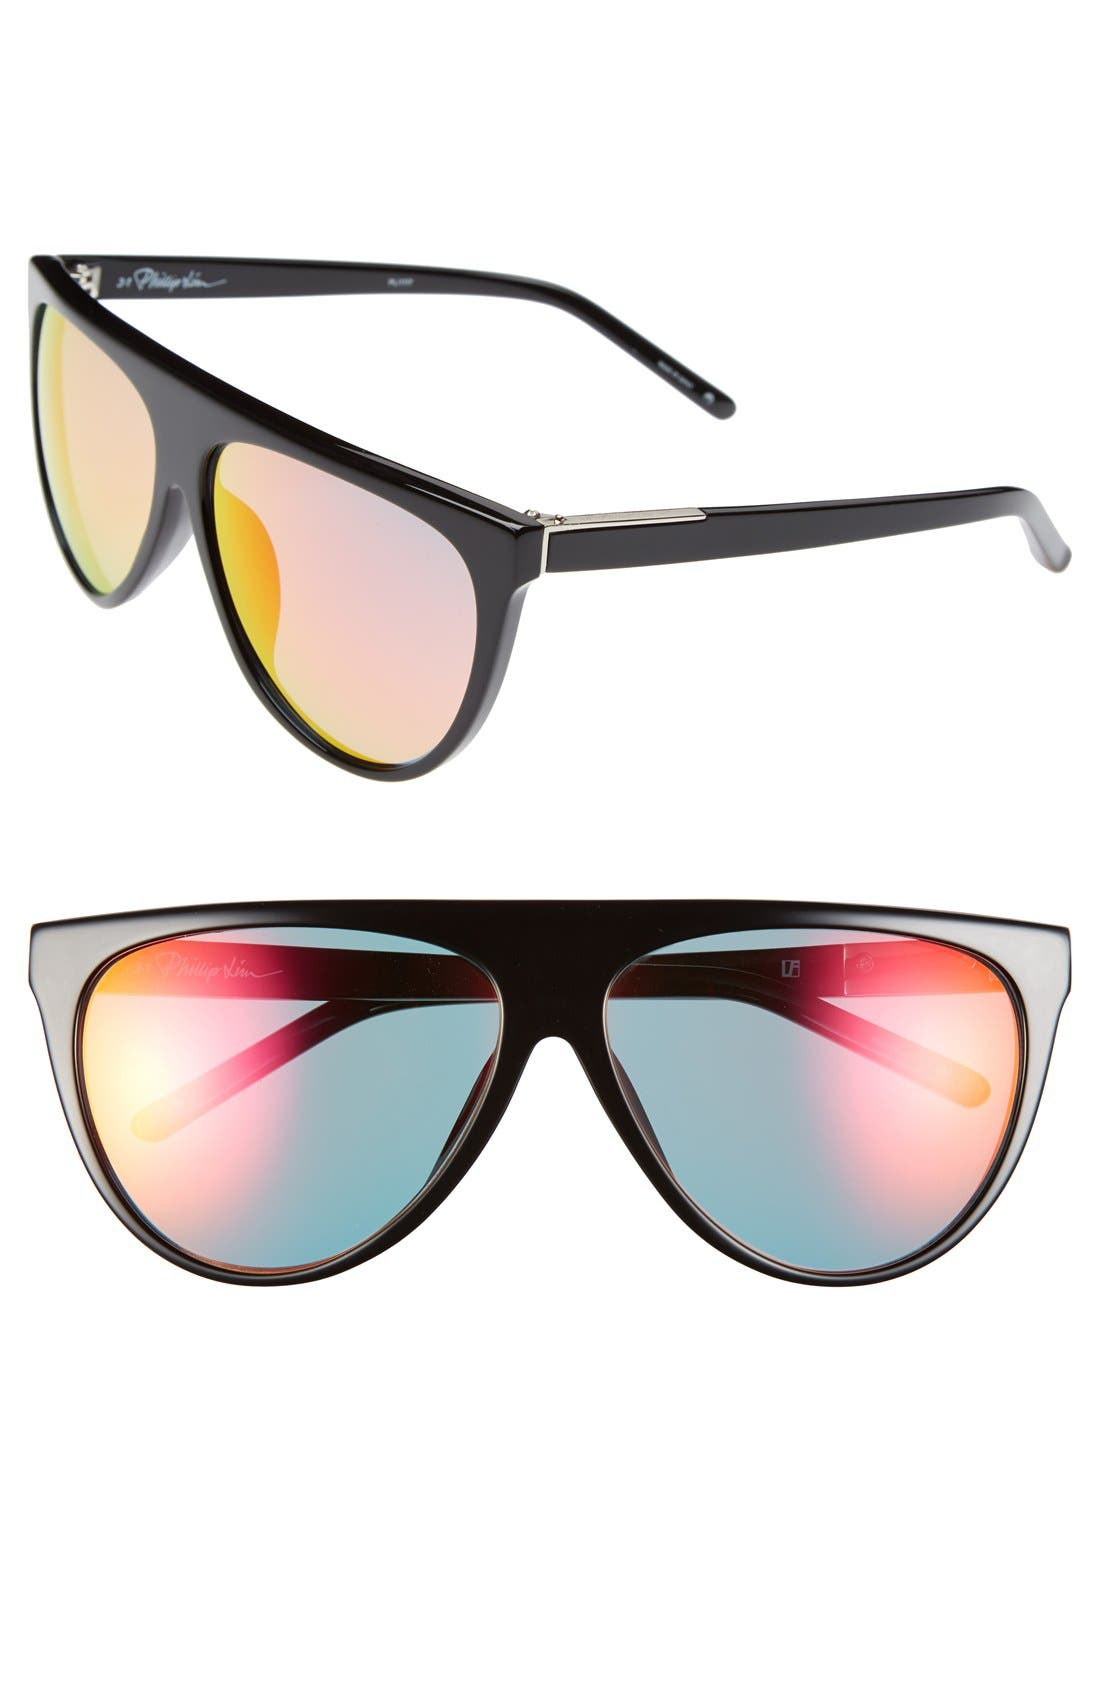 Alternate Image 1 Selected - 3.1 Phillip Lim 62mm Sunglasses